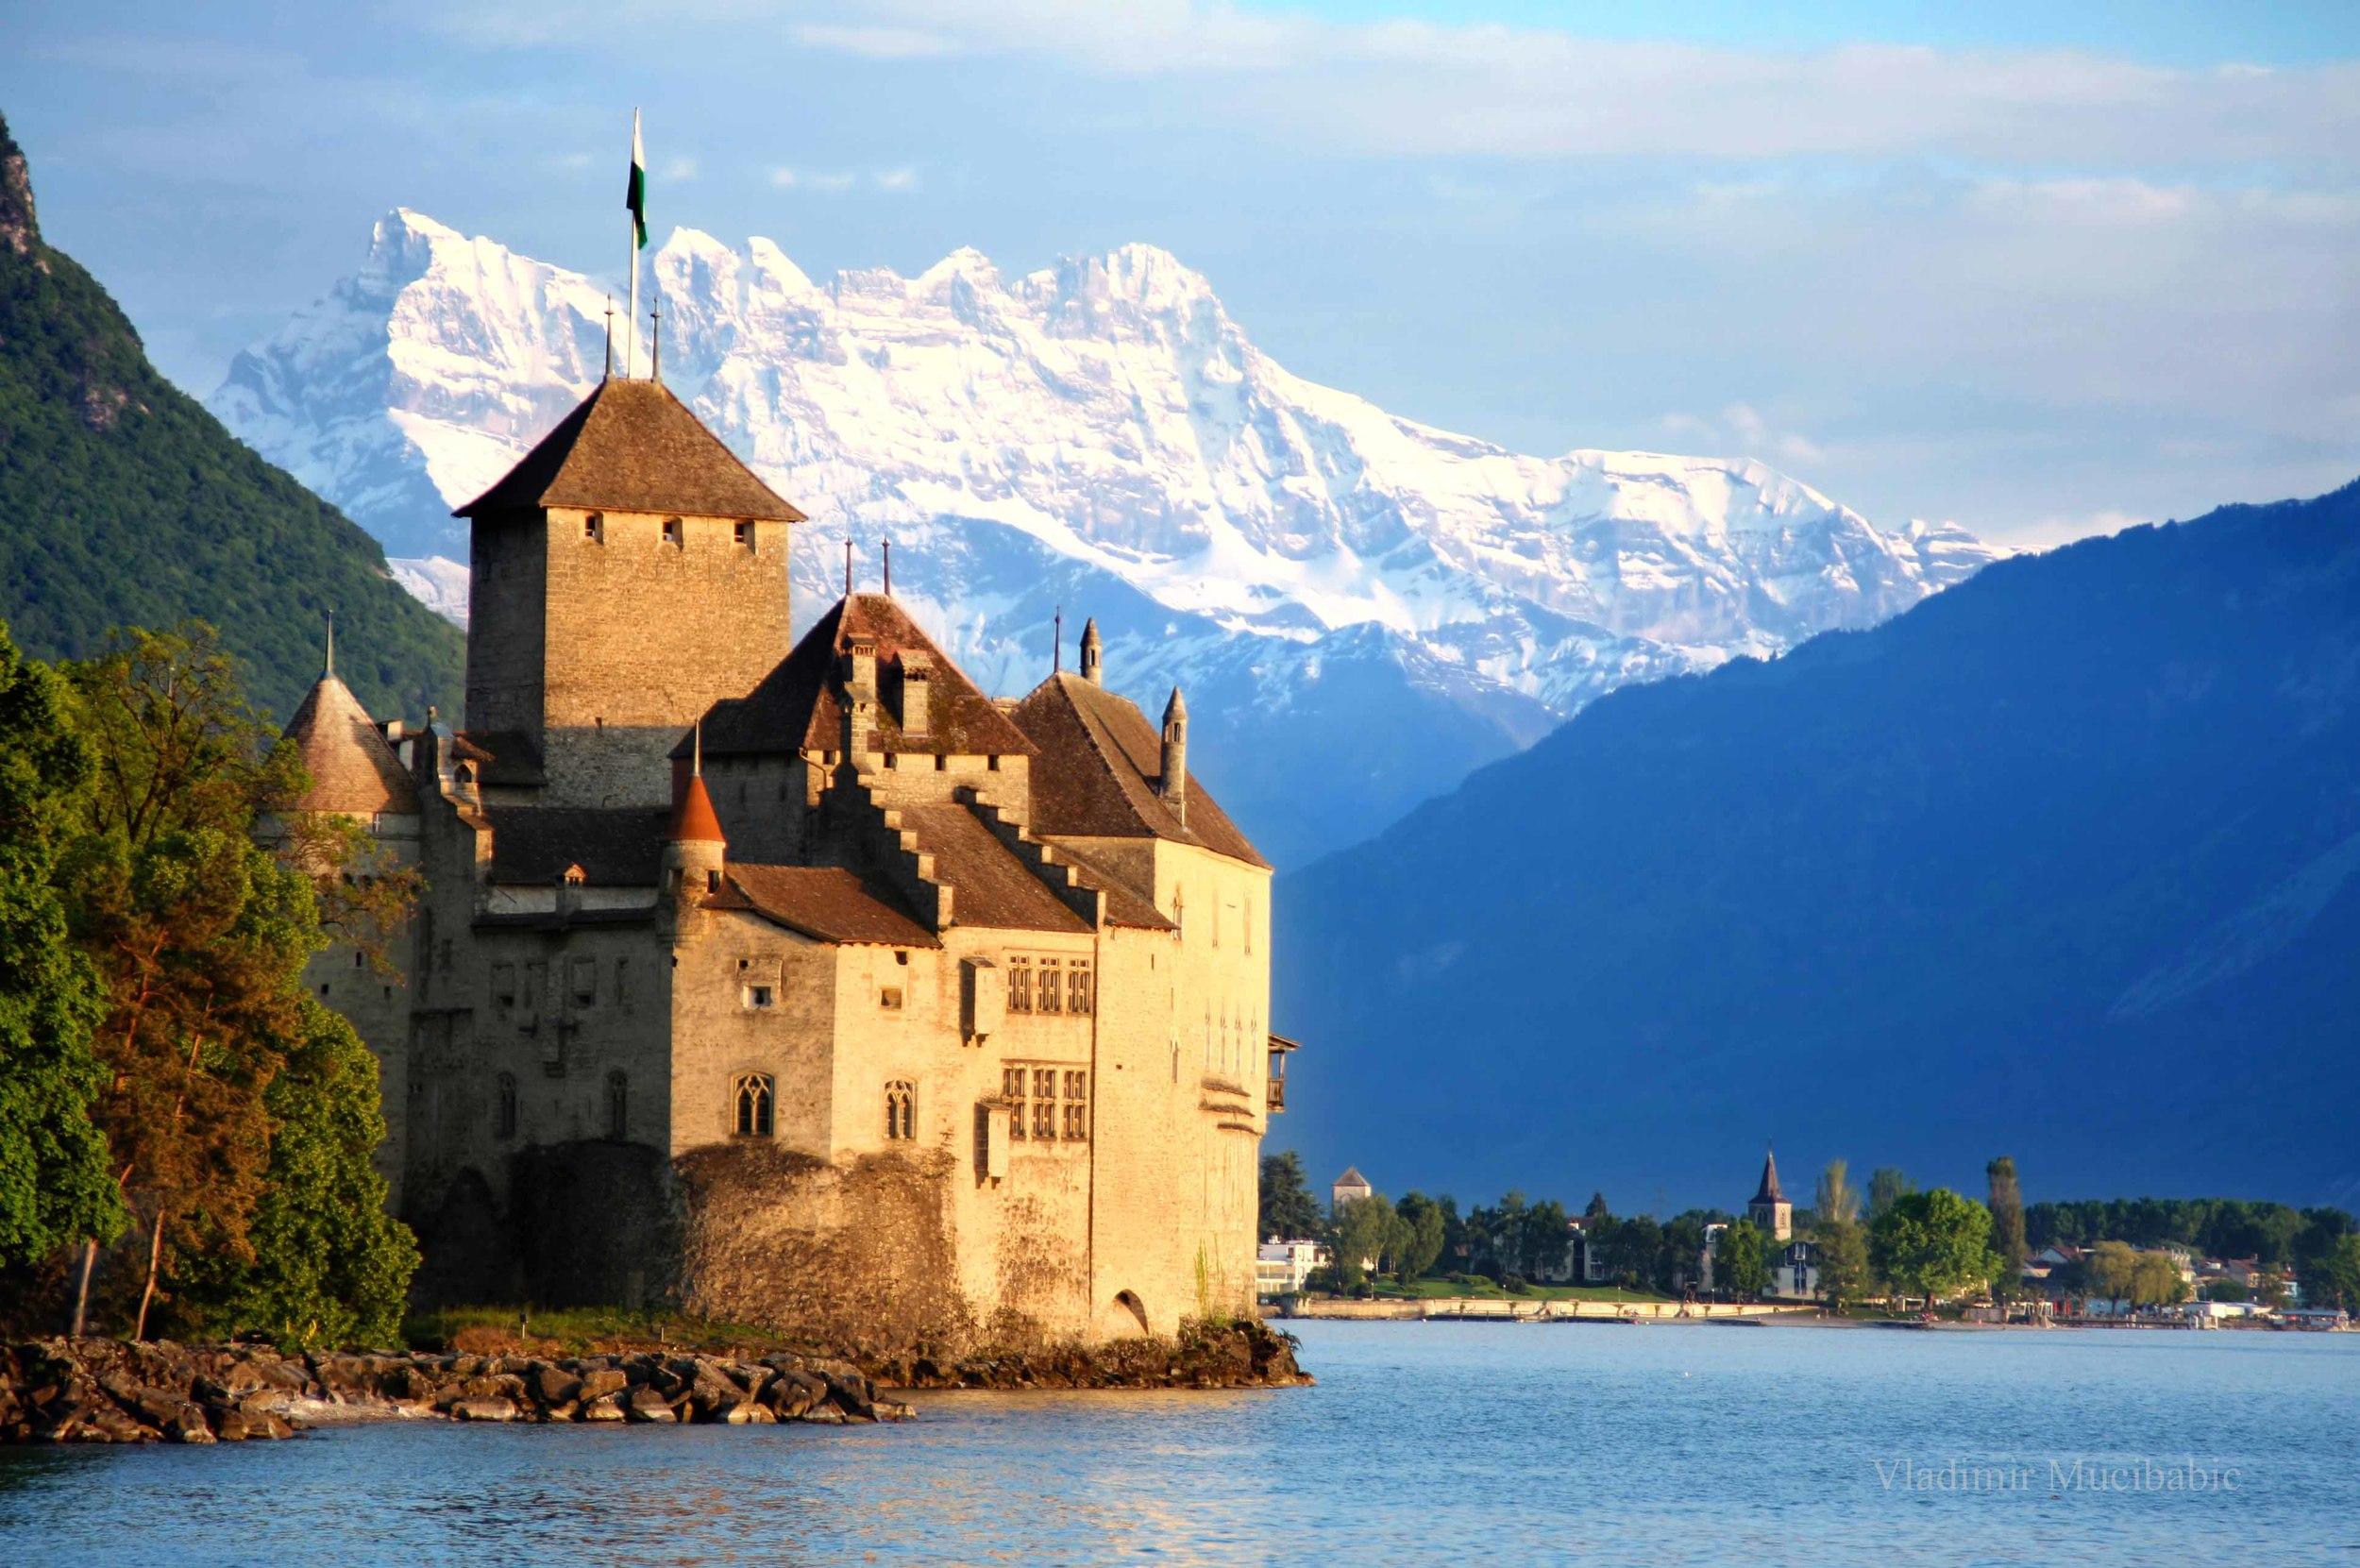 Chateau Chillon inMontreux, Switzerland